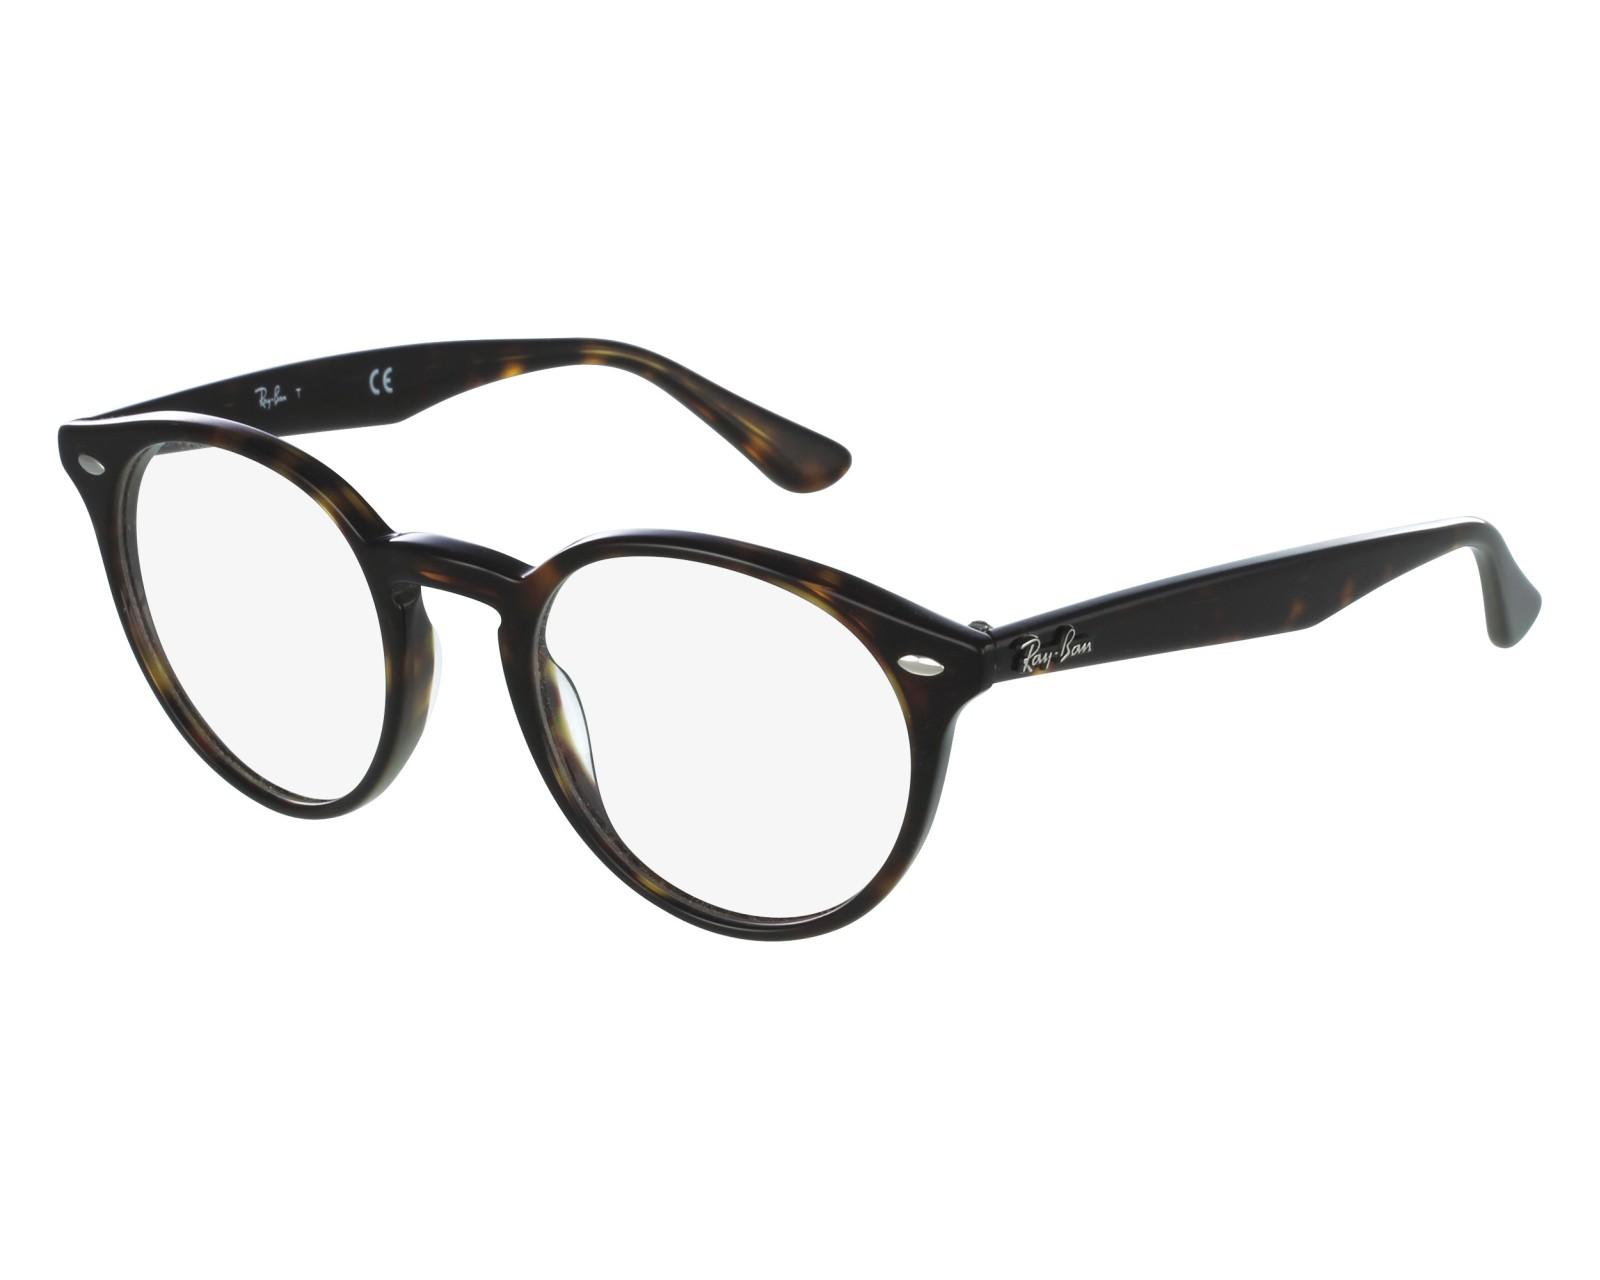 6ba559d128 eyeglasses Ray-Ban RX-2180-V 2012 47-21 Havana front view